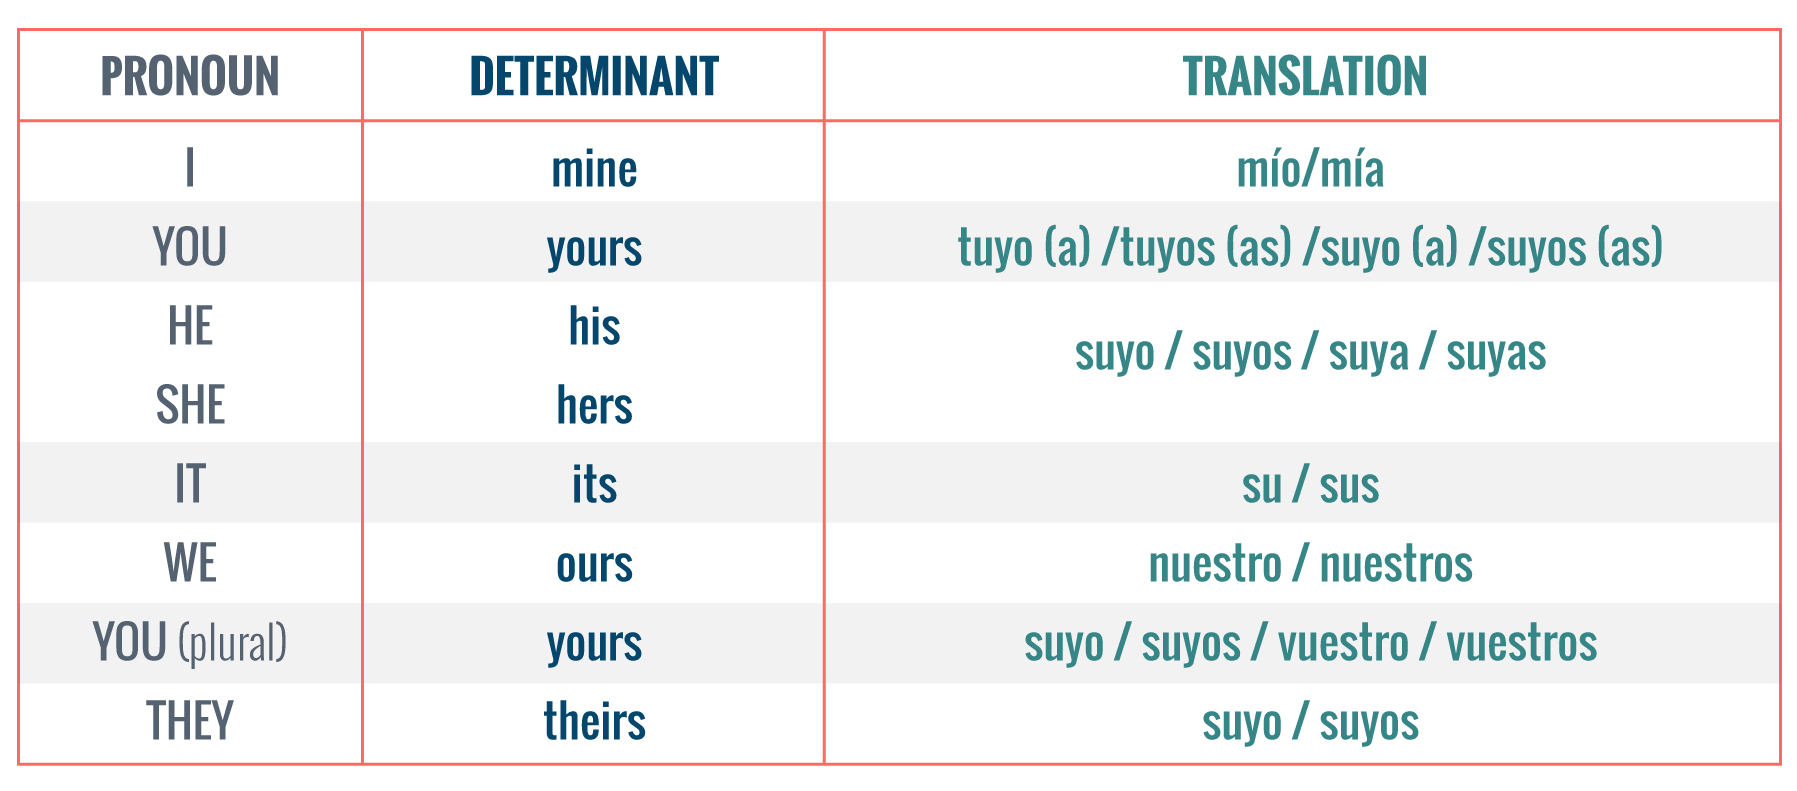 Tabla de pronombres posesivos como pronombres.